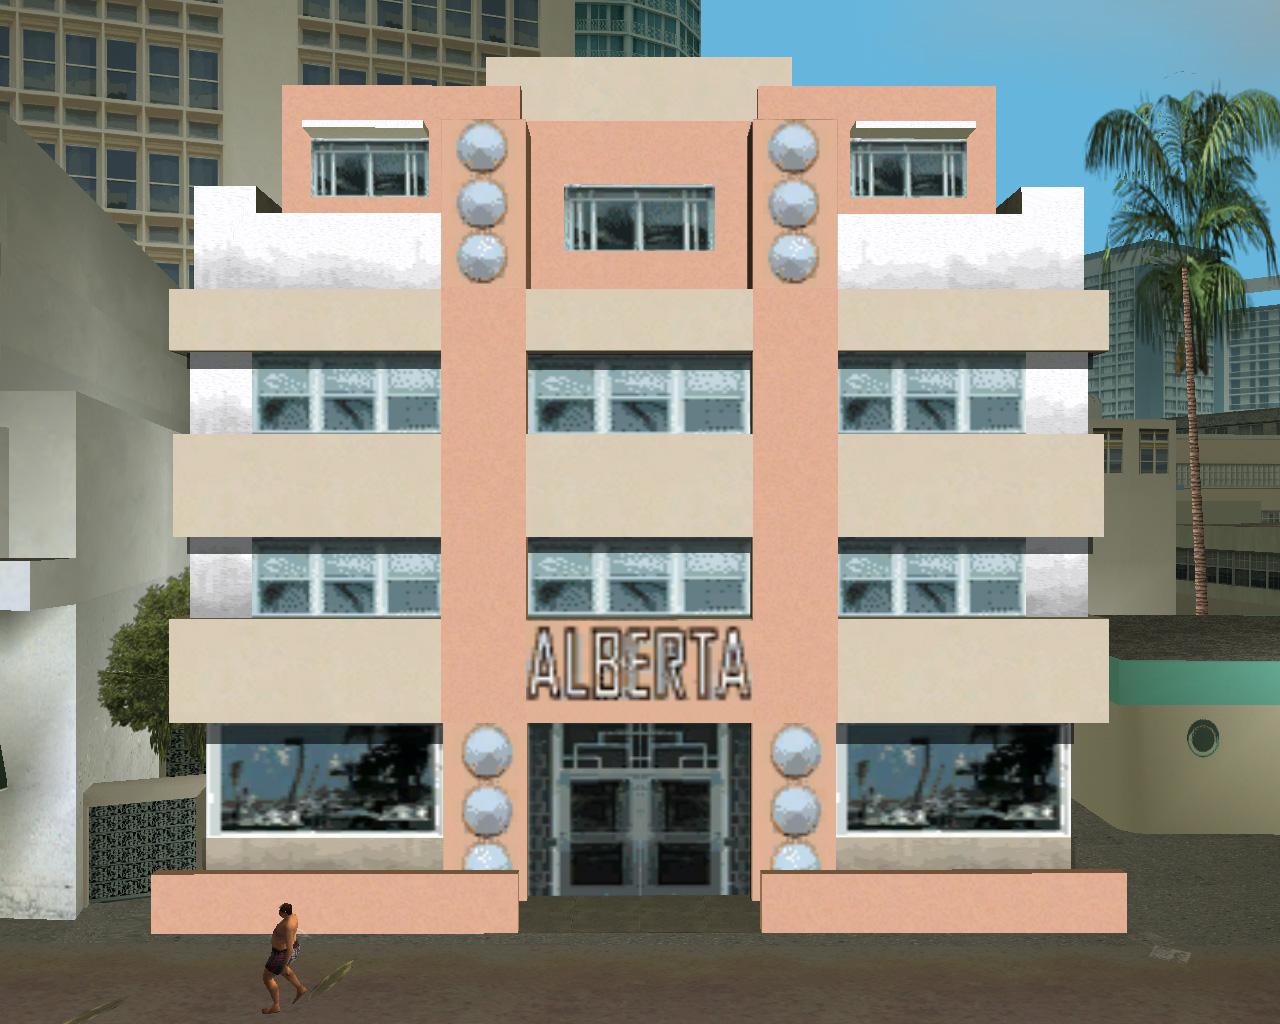 Alberta Hotel